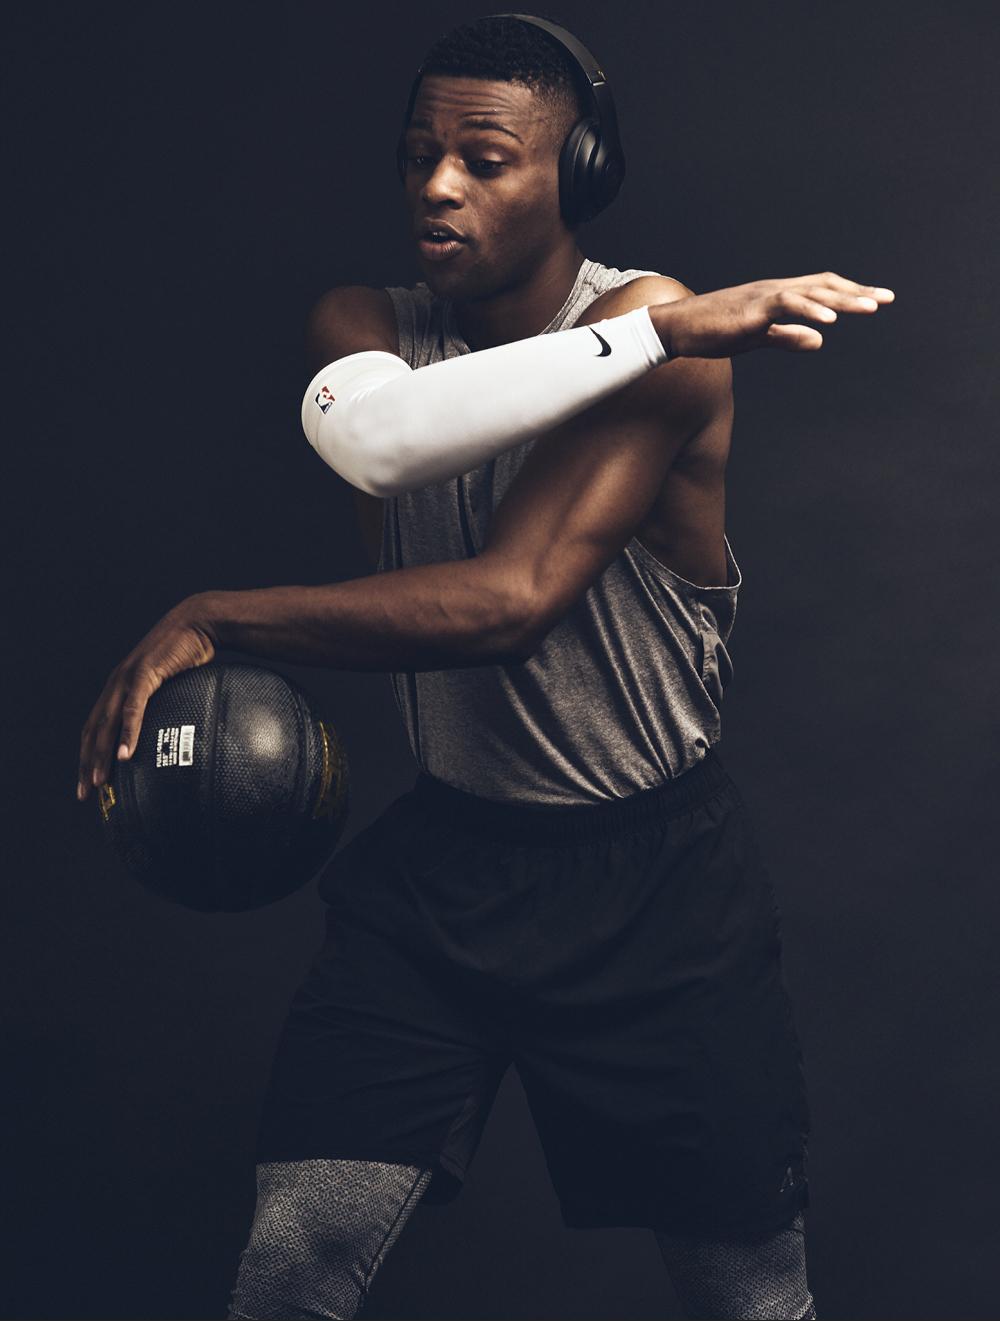 Everett_Aaron_Okayama_Basketball42.jpg